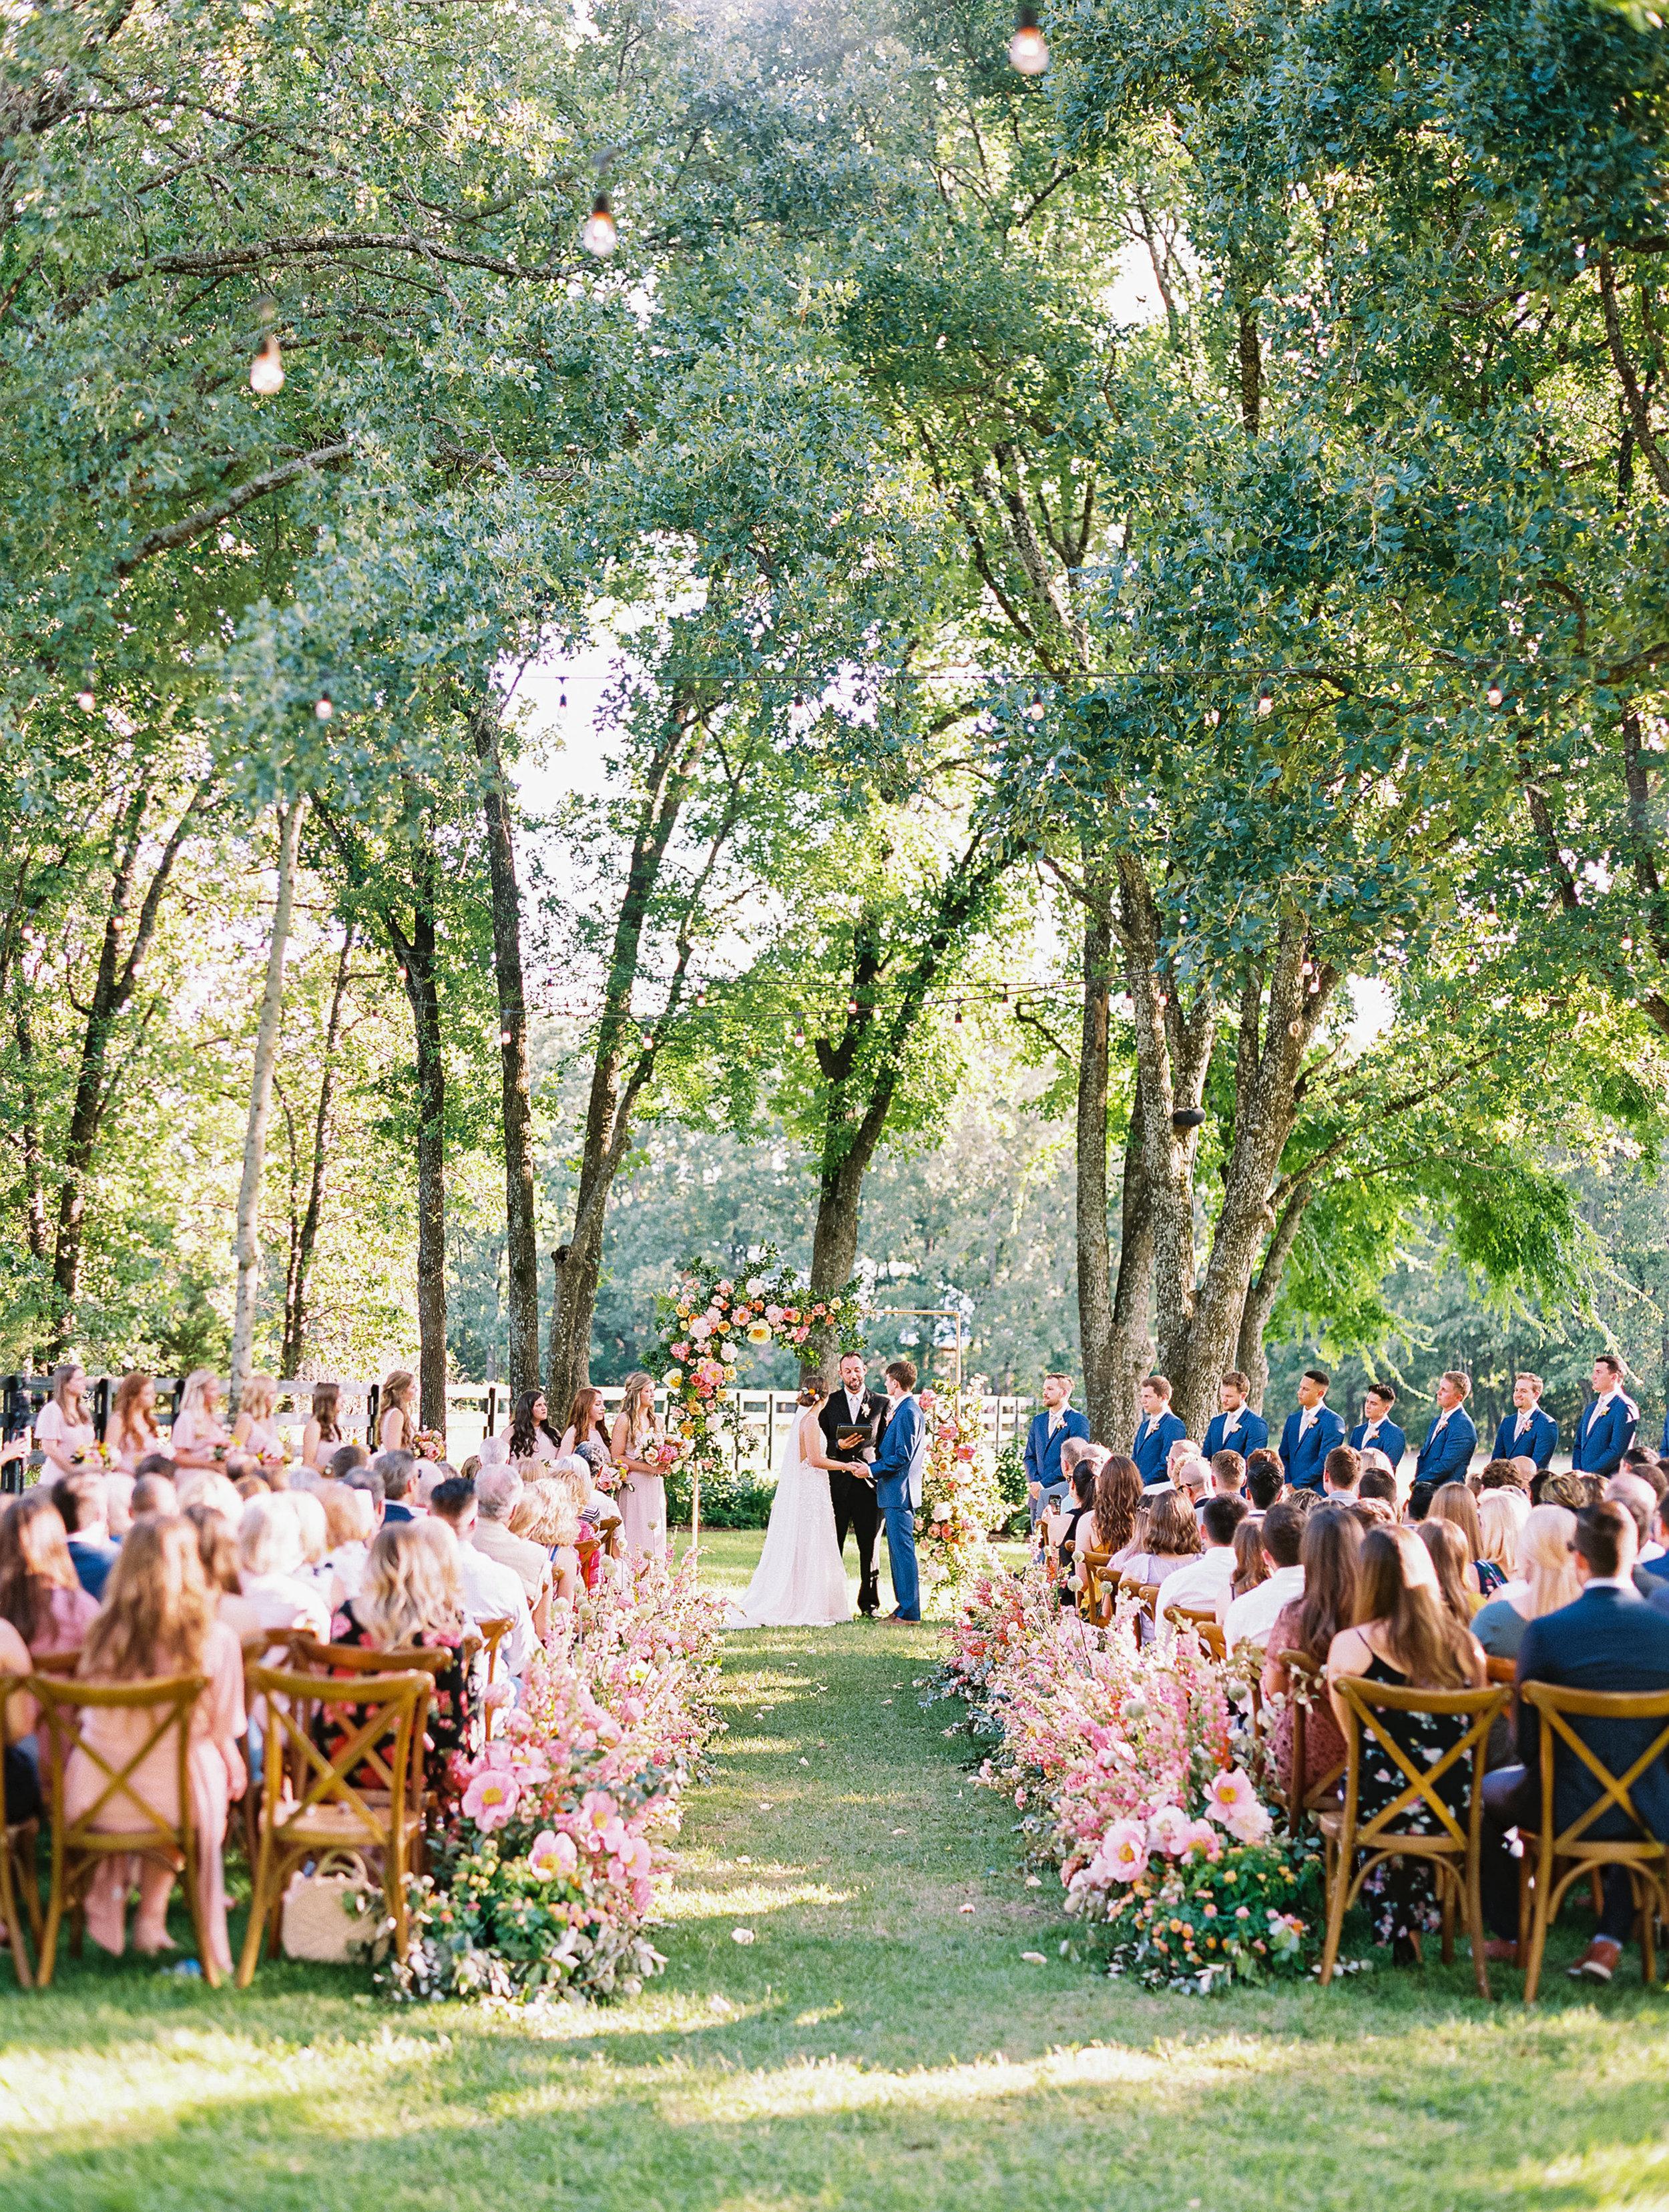 Evie & Joe - Joyful Summer Wedding Full of Color